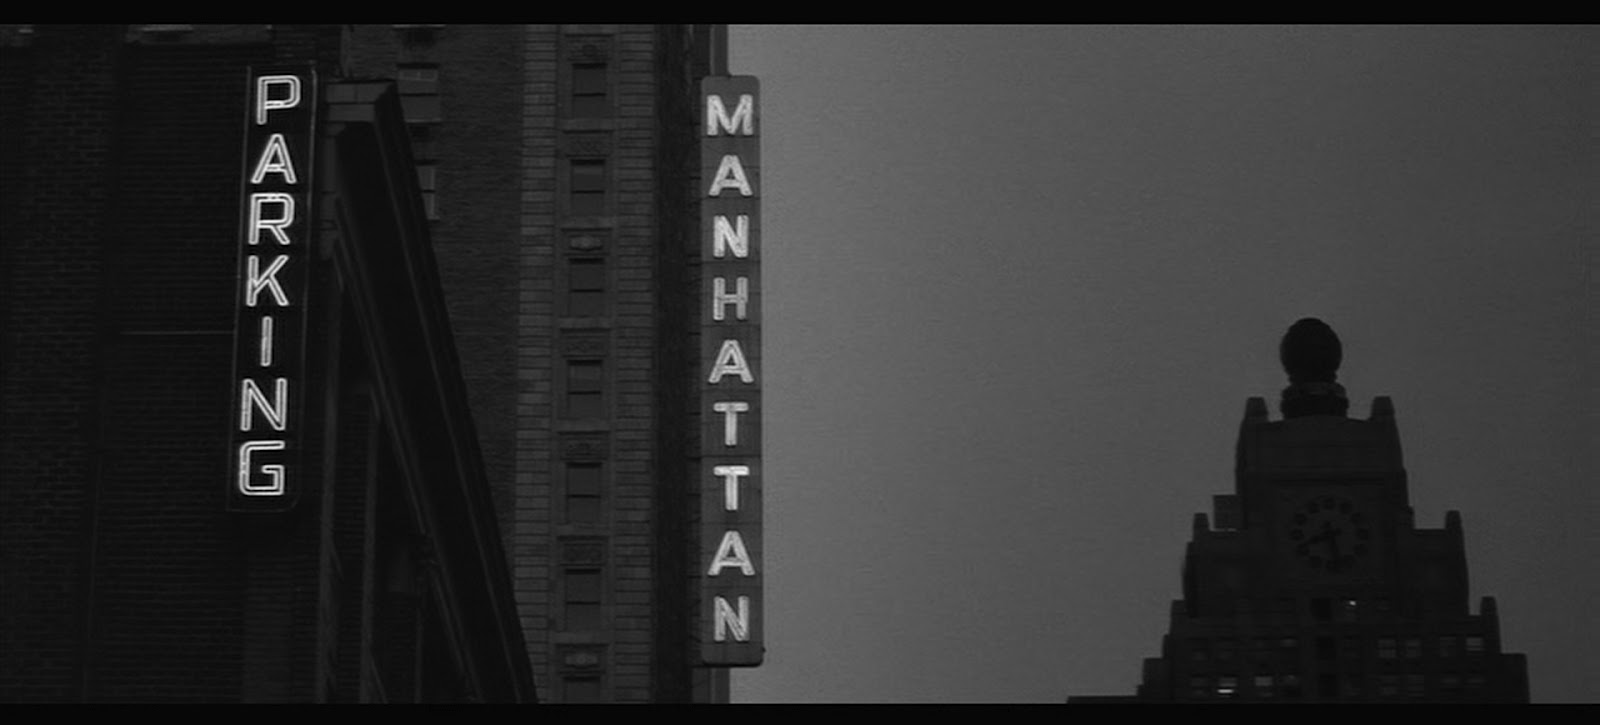 manhattan-woody-allen-neon-lights